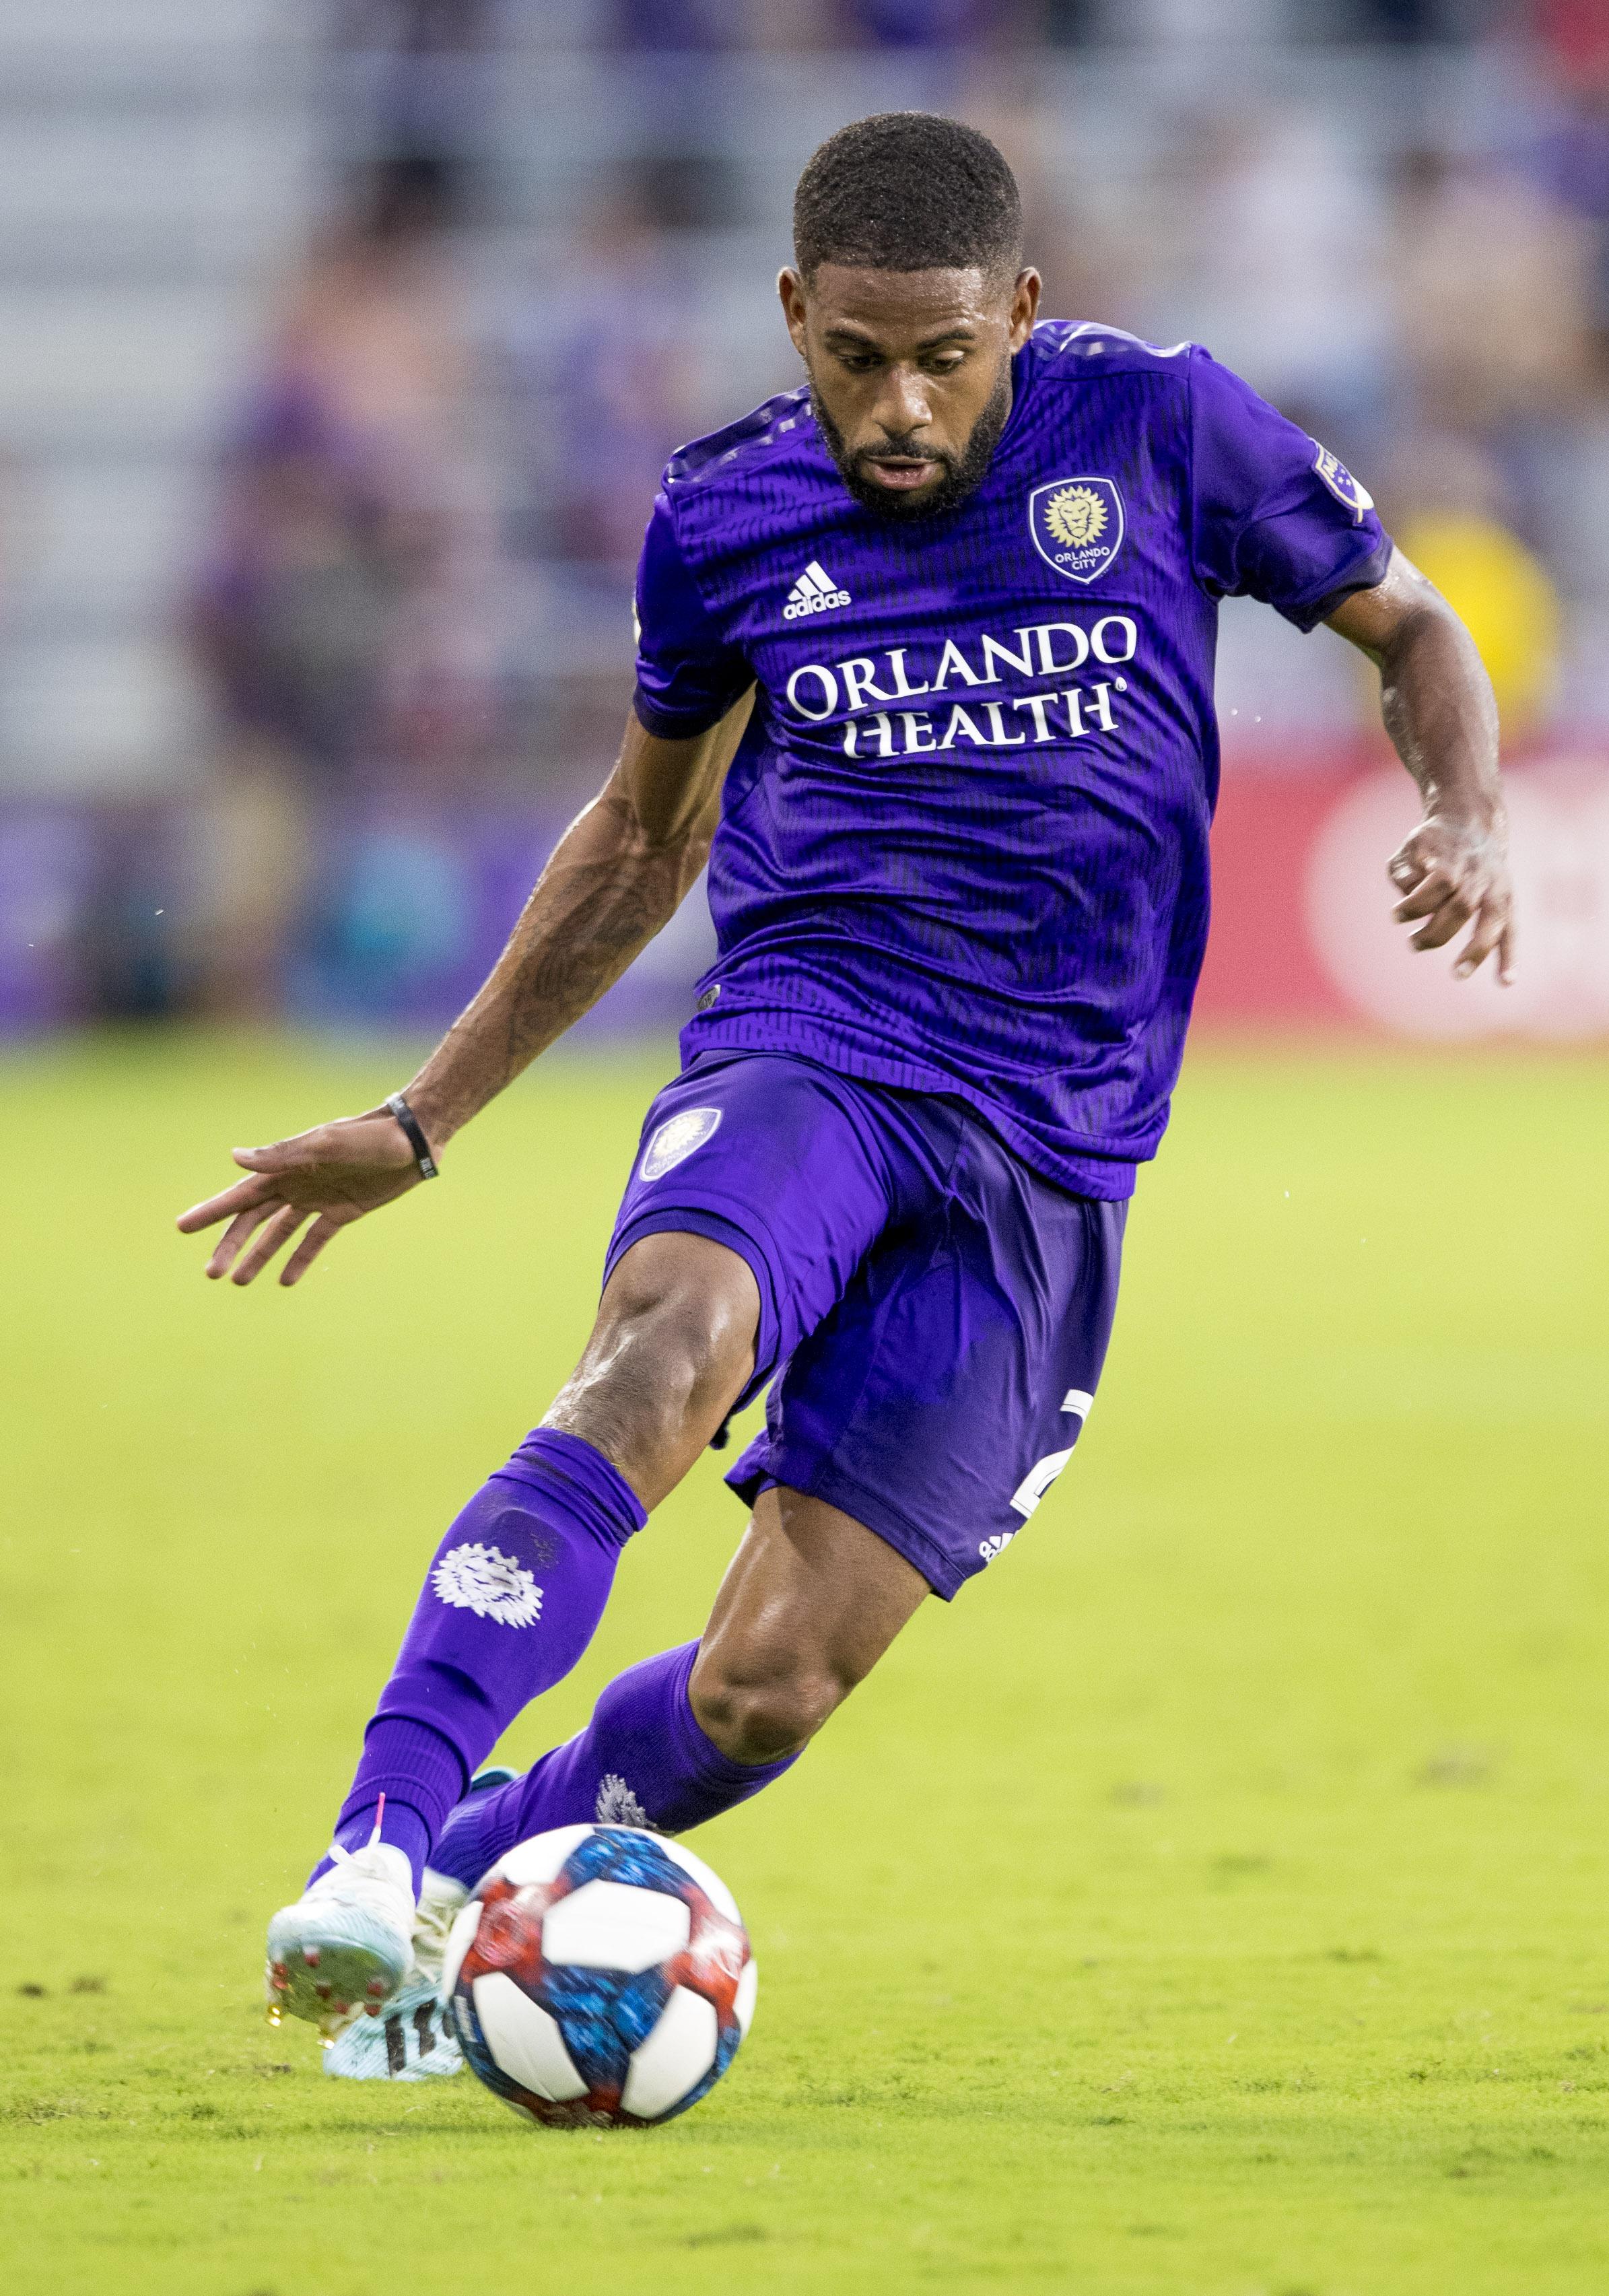 SOCCER: AUG 03 MLS - FC Dallas at Orlando City SC